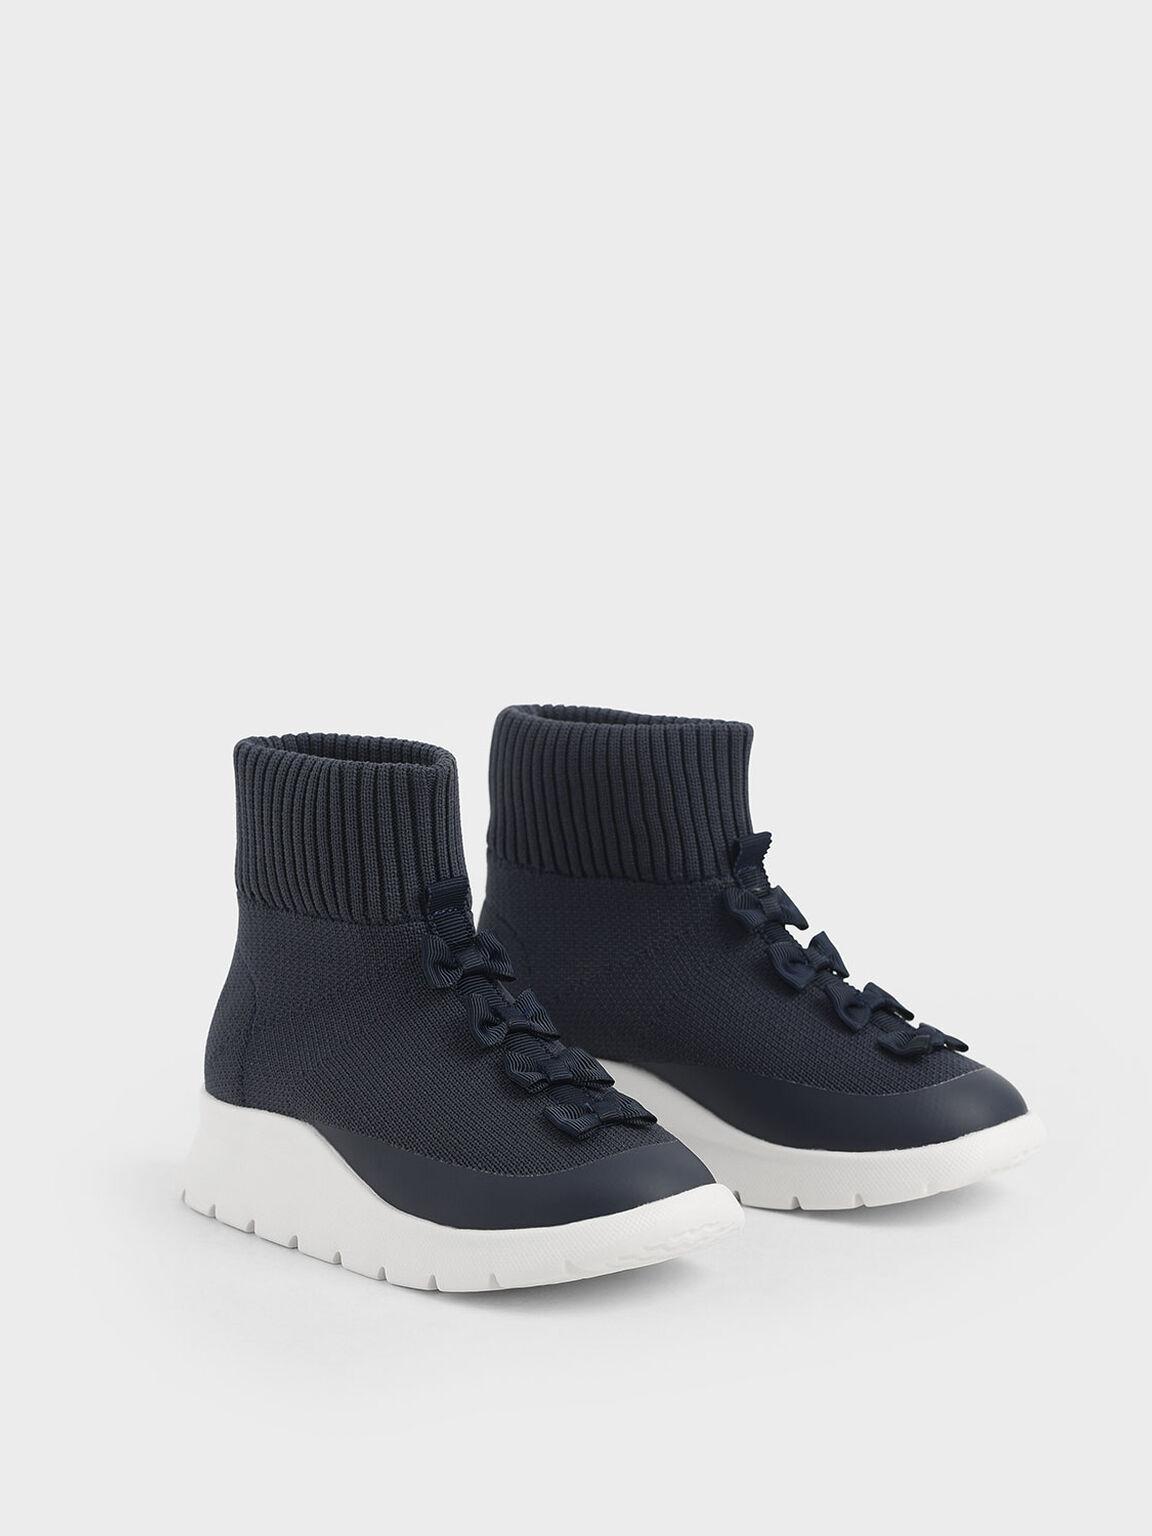 Girls' Knitted High Top Slip-On Sneakers, Dark Blue, hi-res